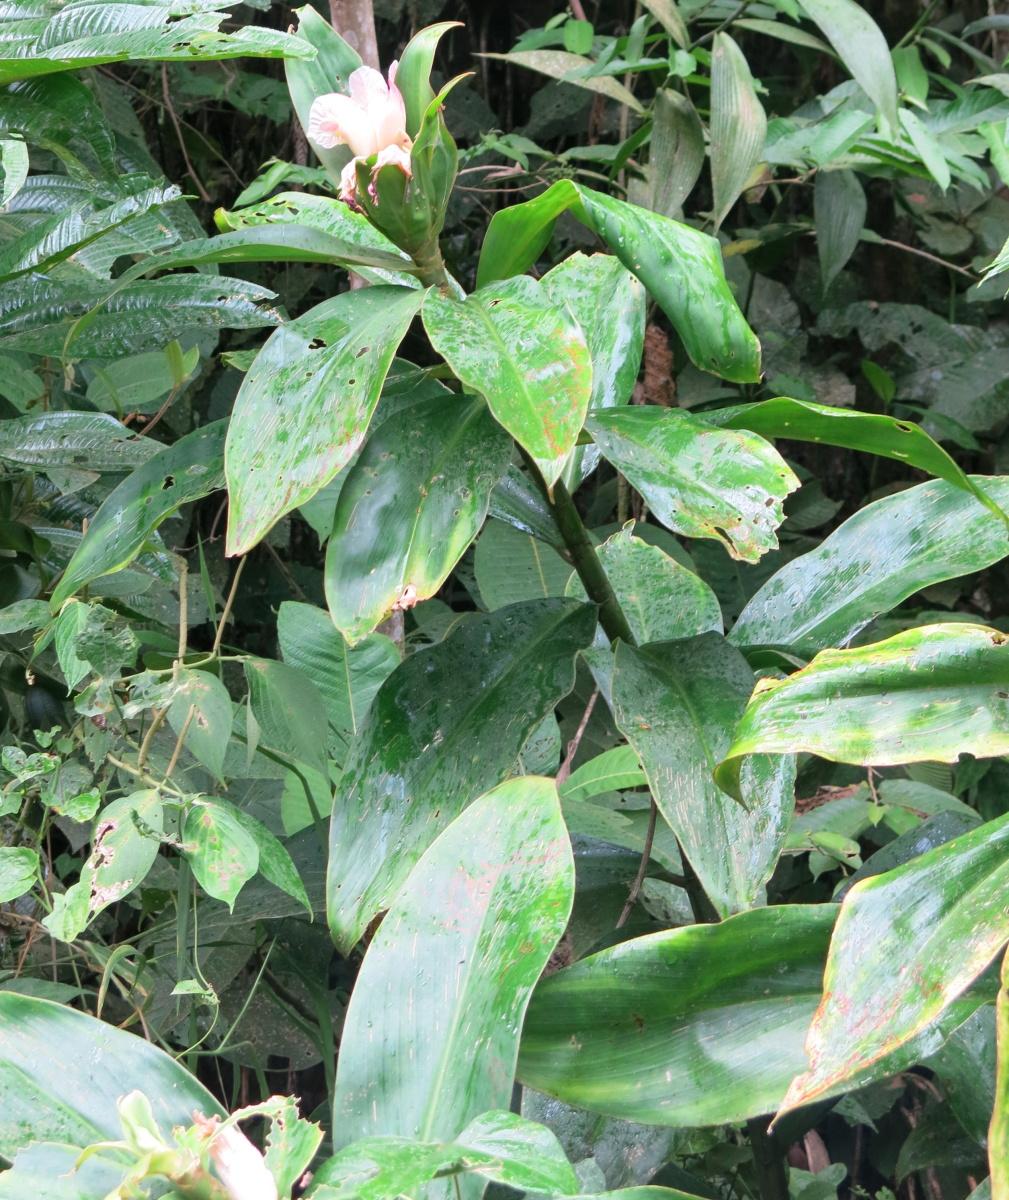 Photo# 17596 - Costus 'Reina Rosada'  found in El Zarza area - Cord del Condor, Zamora Chinchipe, Ecuador.  Possible natural hybrid of C. amazonicuswith C. zamoranus.